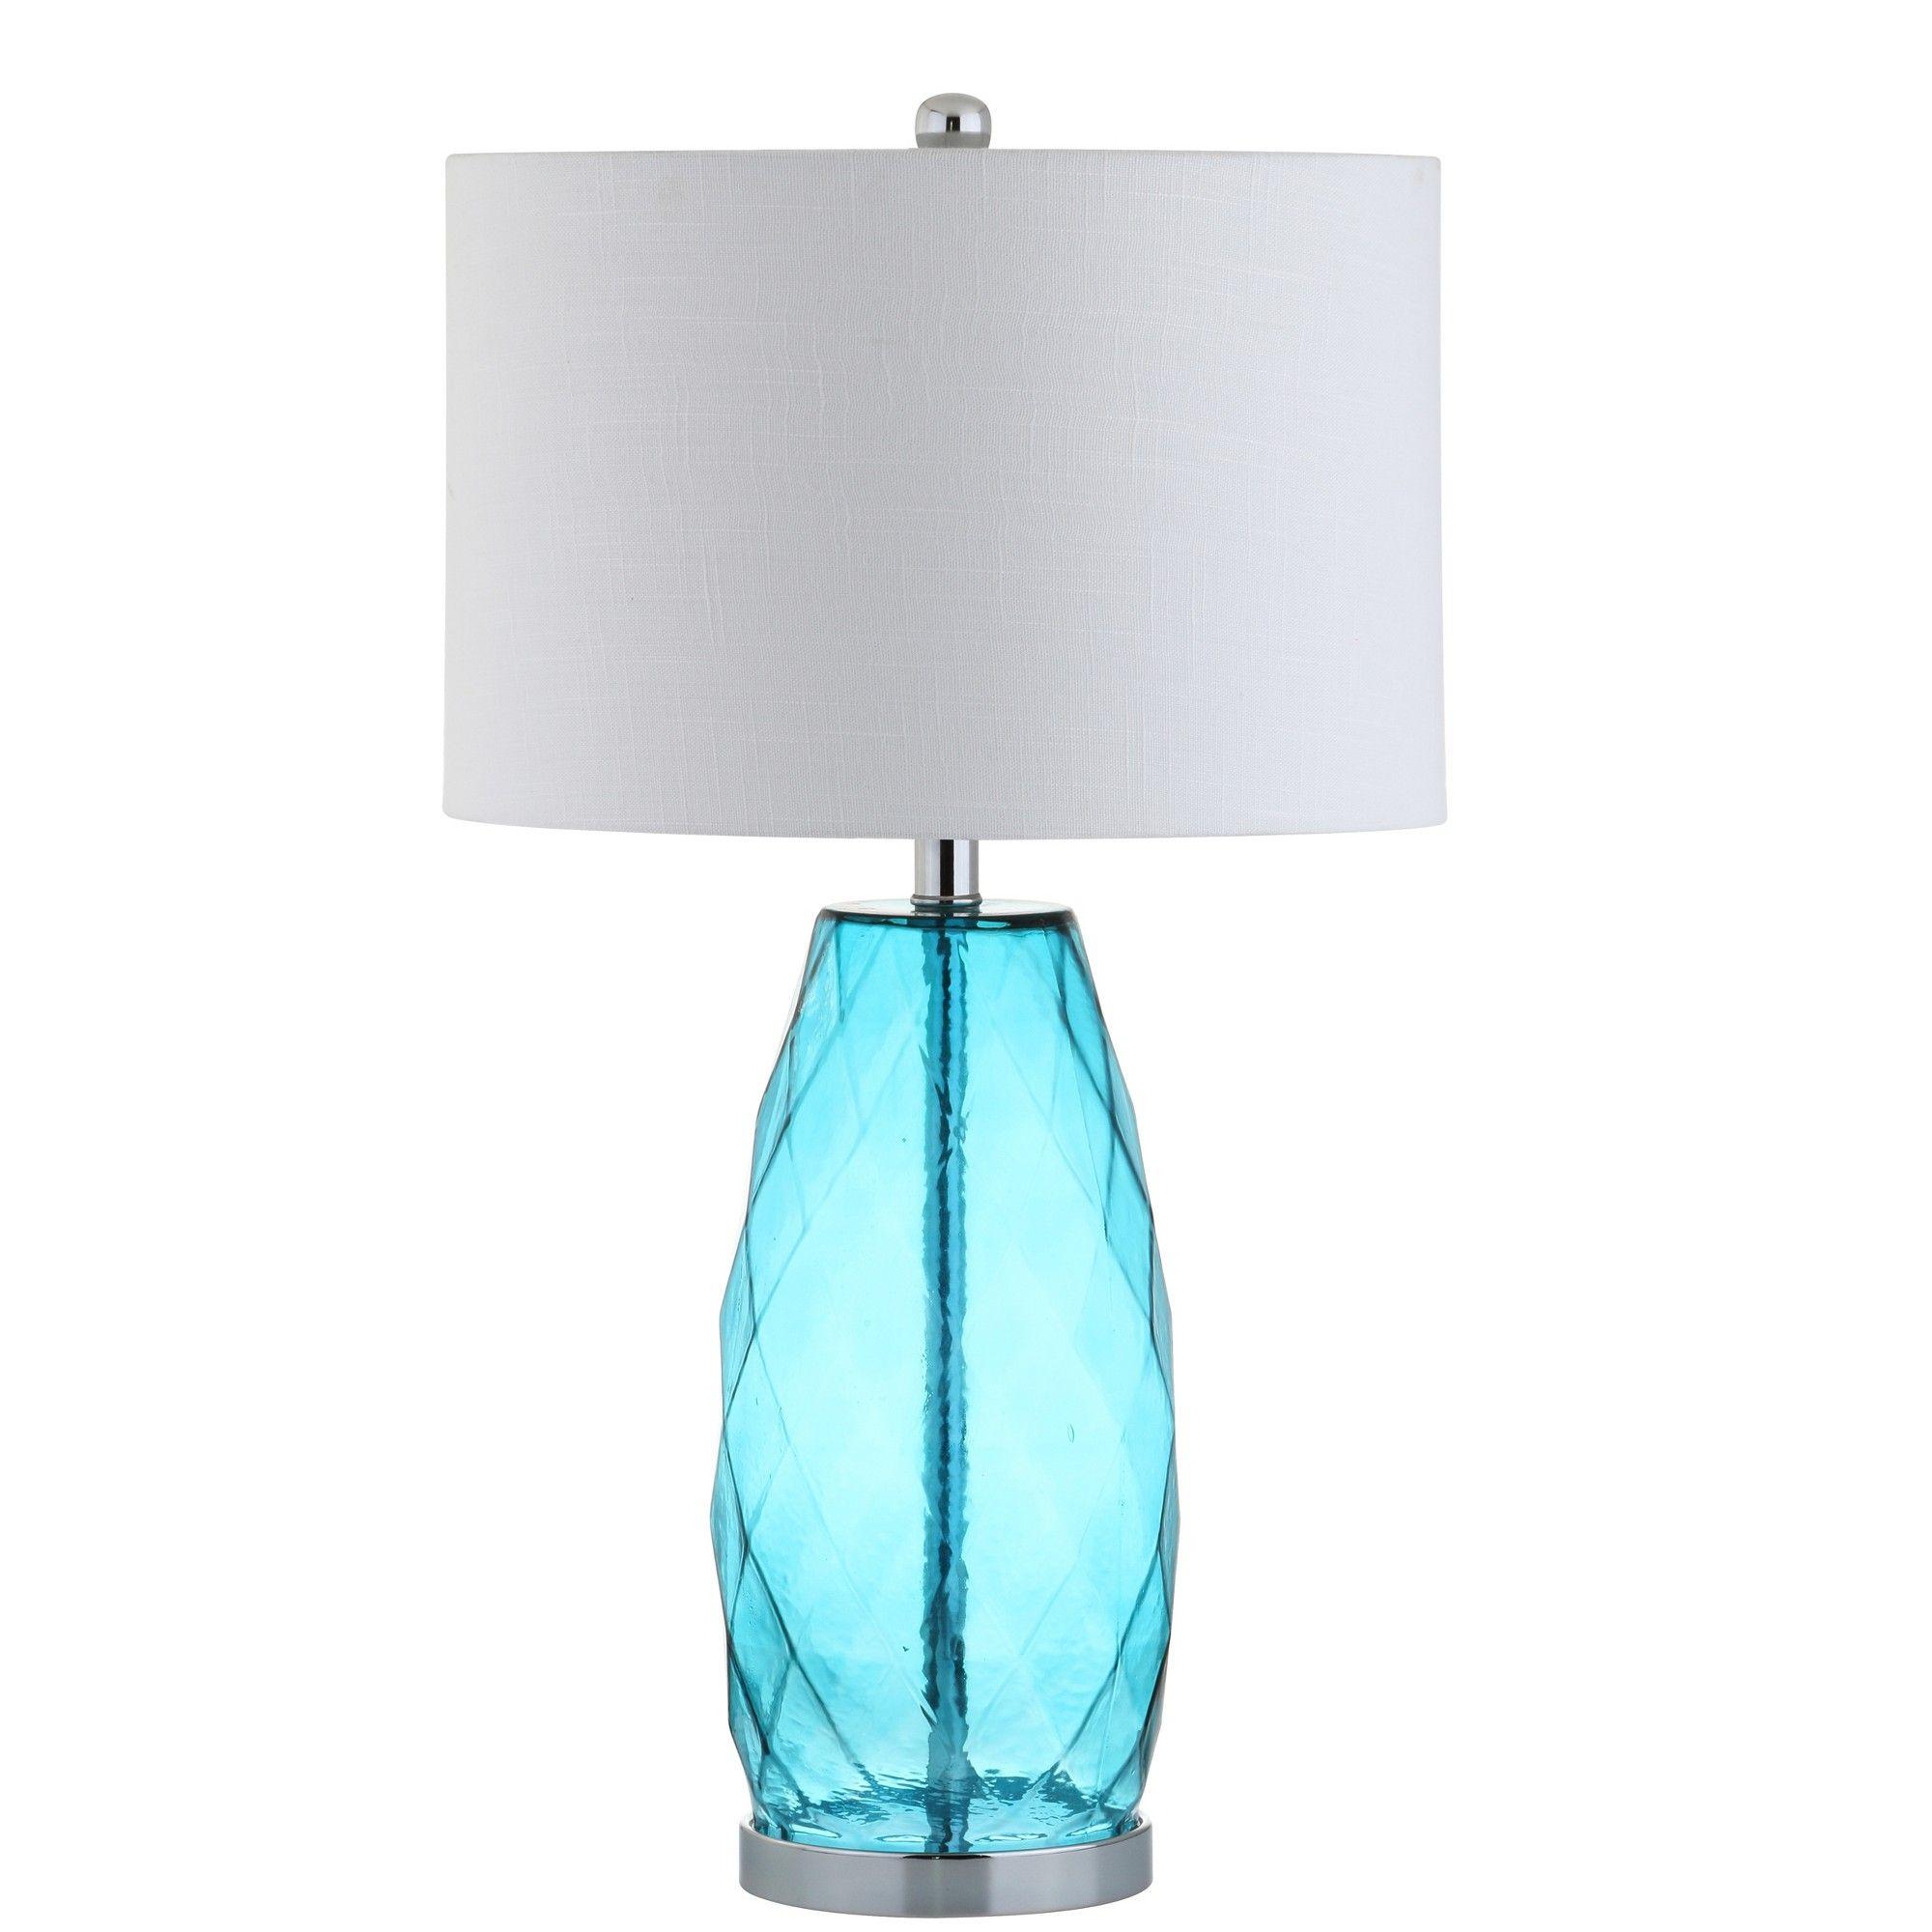 Aqua Ocean Blue Glass Table Lamp